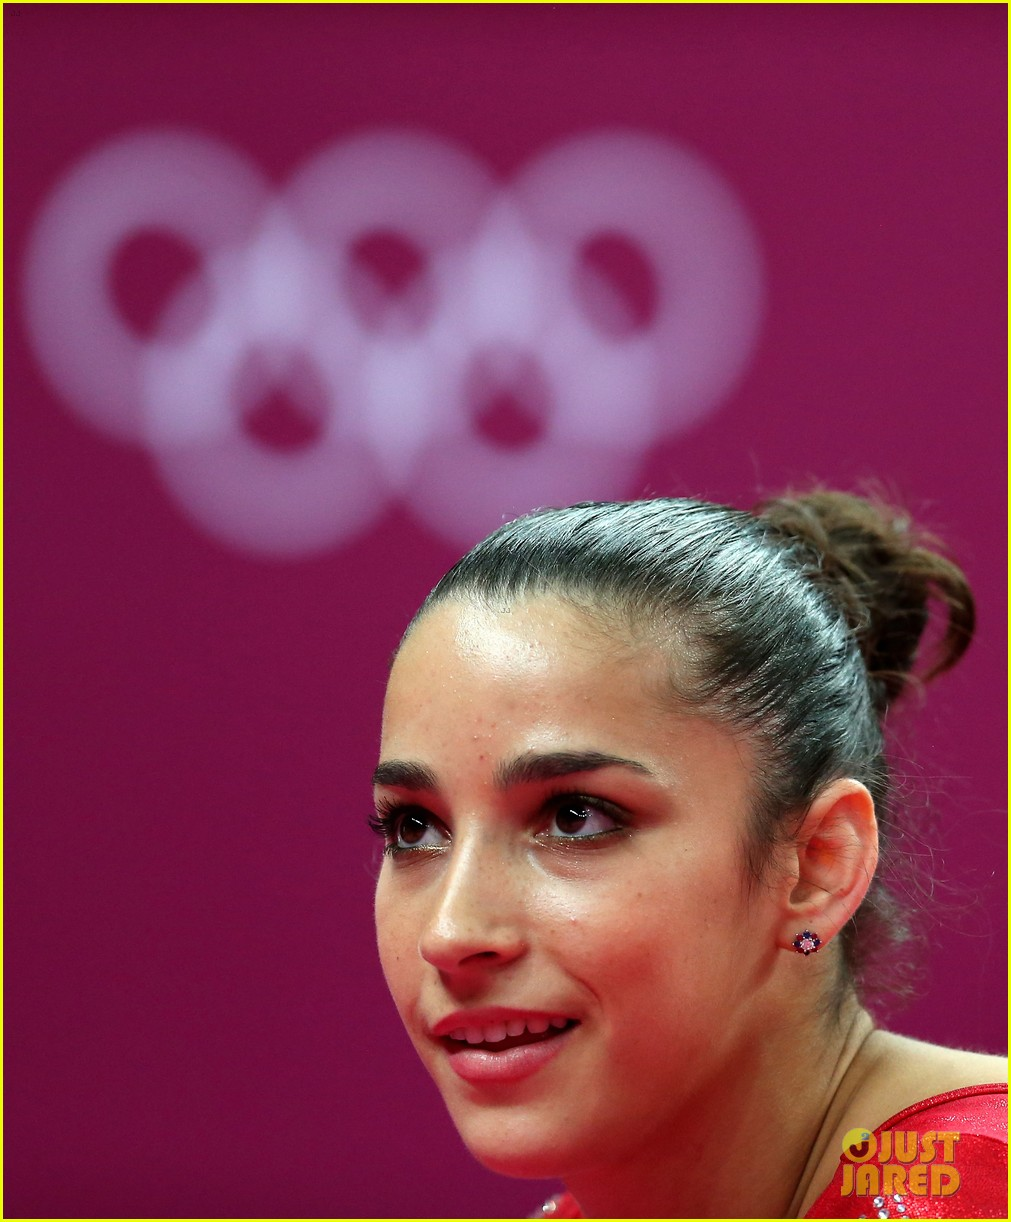 | imagetwist.com imagesize:1440x960c U.S. Women's Gymnastics Team Wins Gold Medal!: Photo 2694873 | 2012 Summer  Olympics London, Aly Raisman, Gabby Douglas, Jordyn Wieber, Kyla Ross, ...